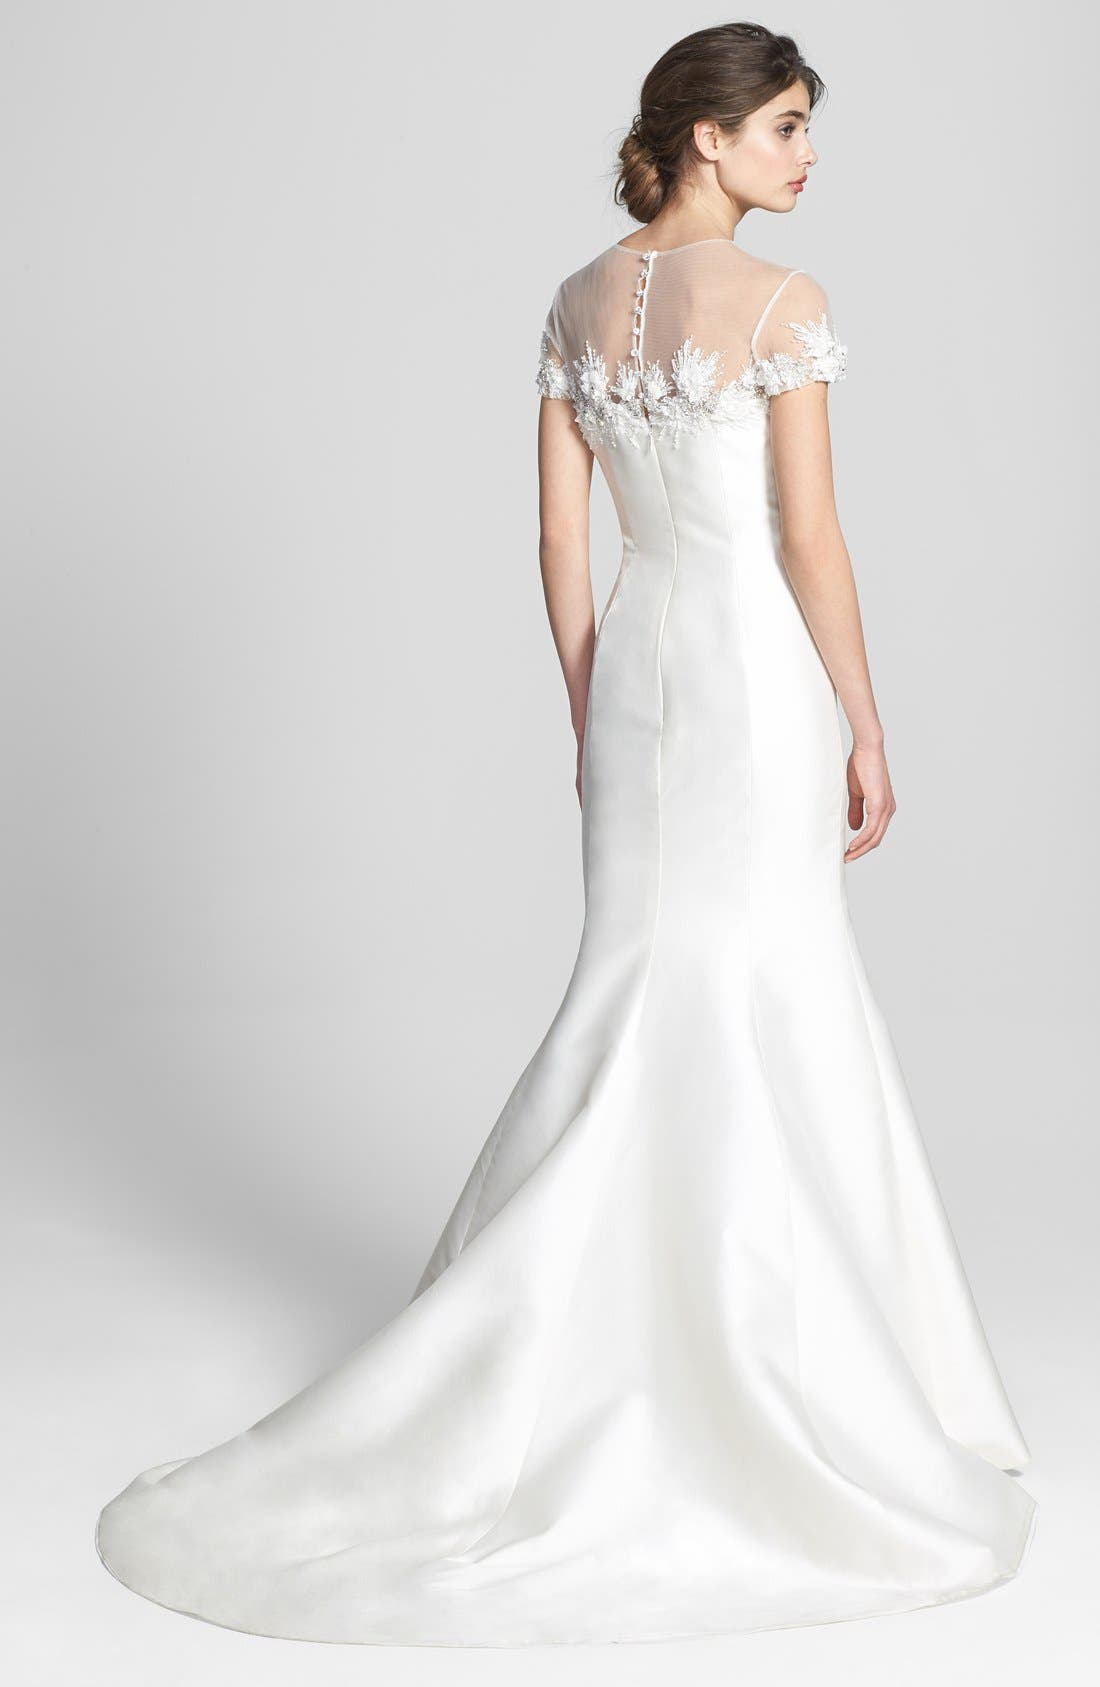 Alternate Image 2  - Badgley Mischka Bridal 'Audrey' Cap Sleeve Embellished Mermaid Dress (In Stores Only)